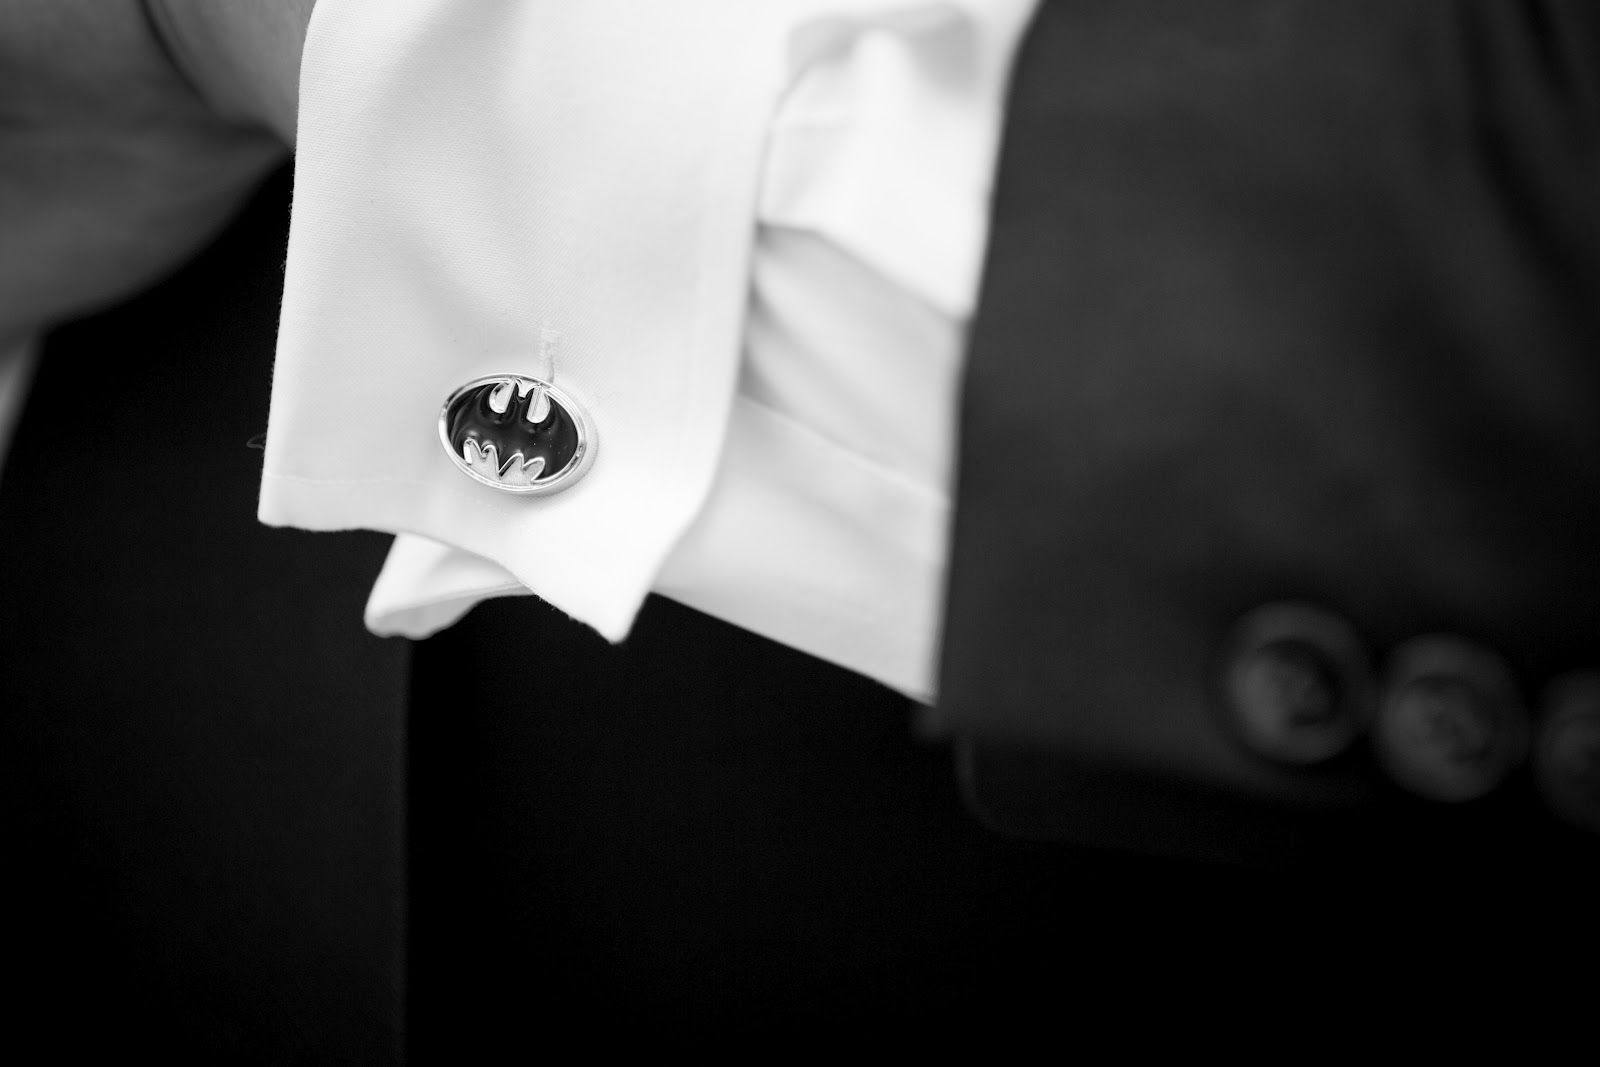 Batman cufflinks for the wedding day. haha if only Geoff wasn't wearing dress blues